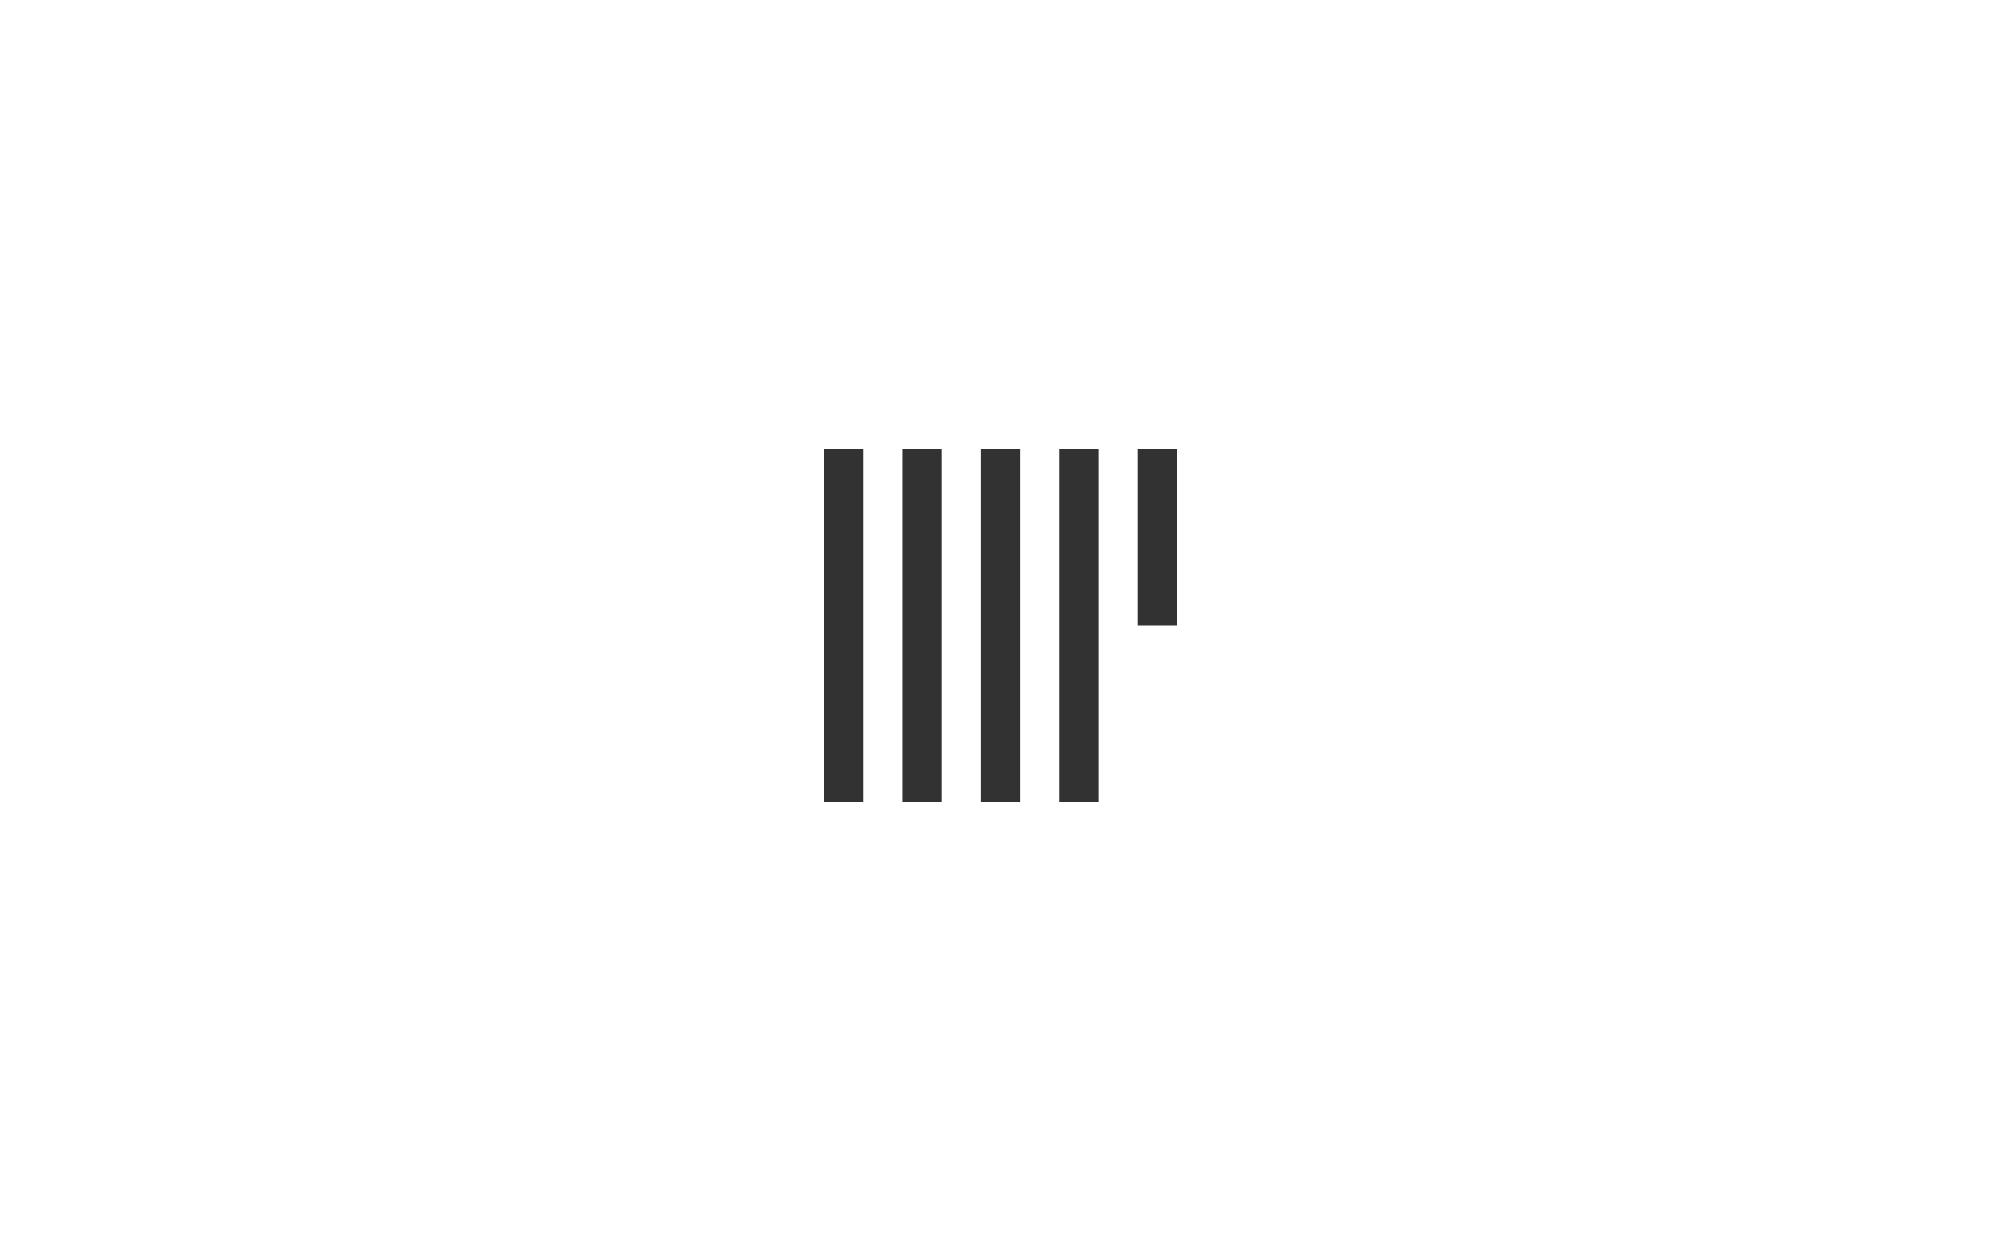 matthew_pomorski_personal_mark_logotype_branding